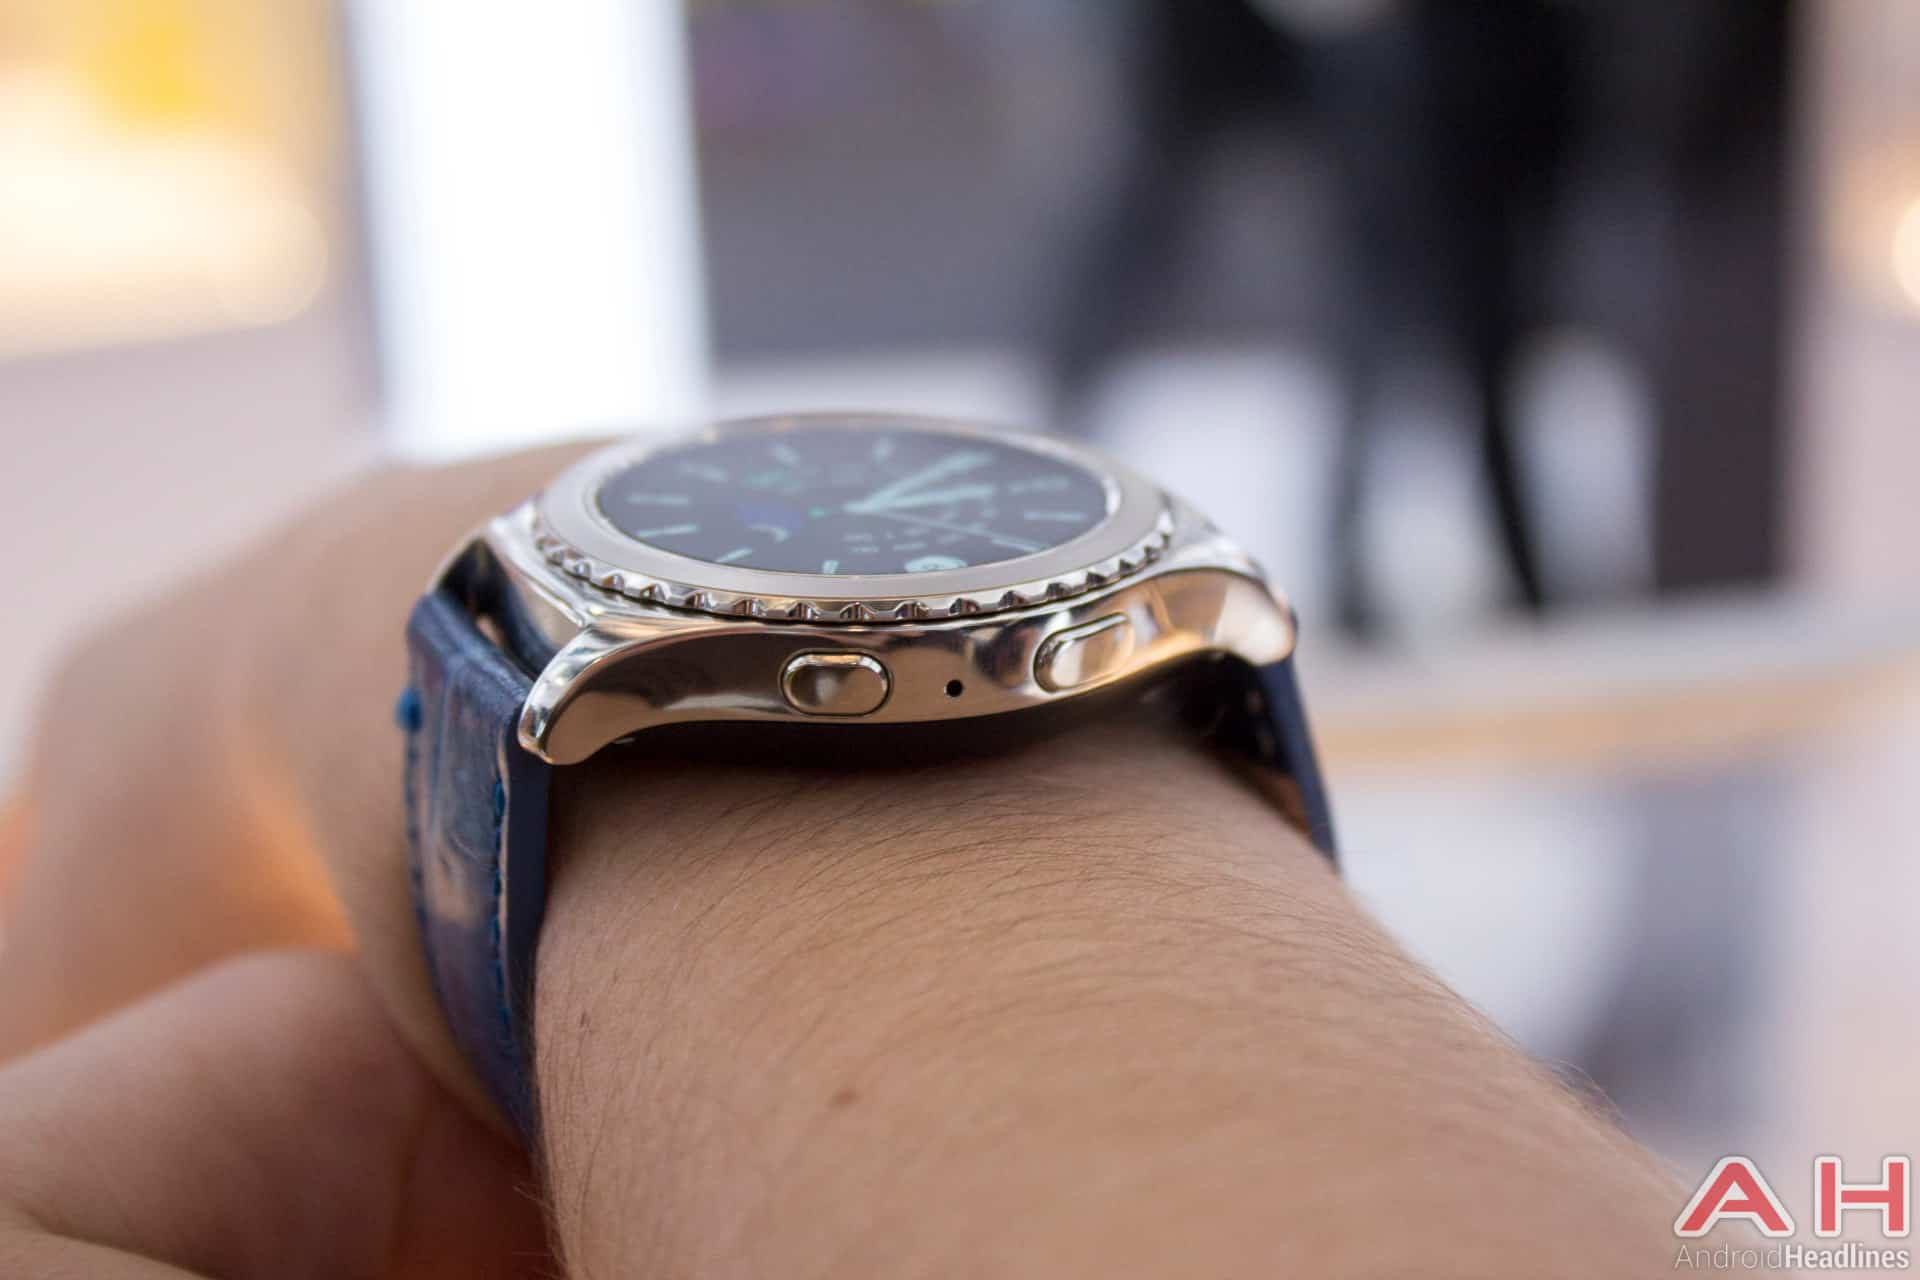 Samsung Gear S2 Platinum AH (3)